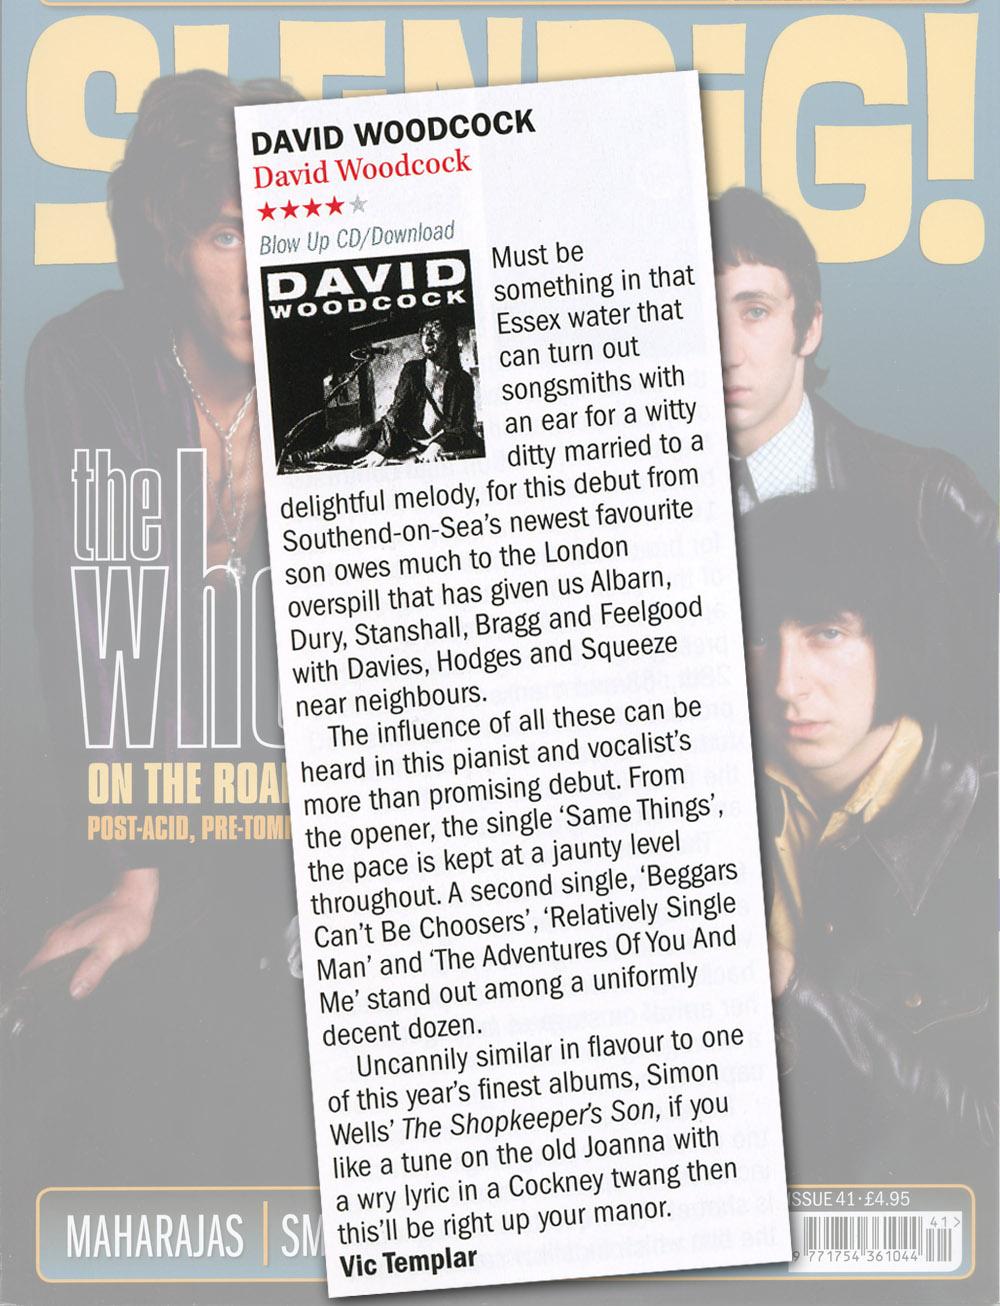 Shindig! David Woodcock Album Review